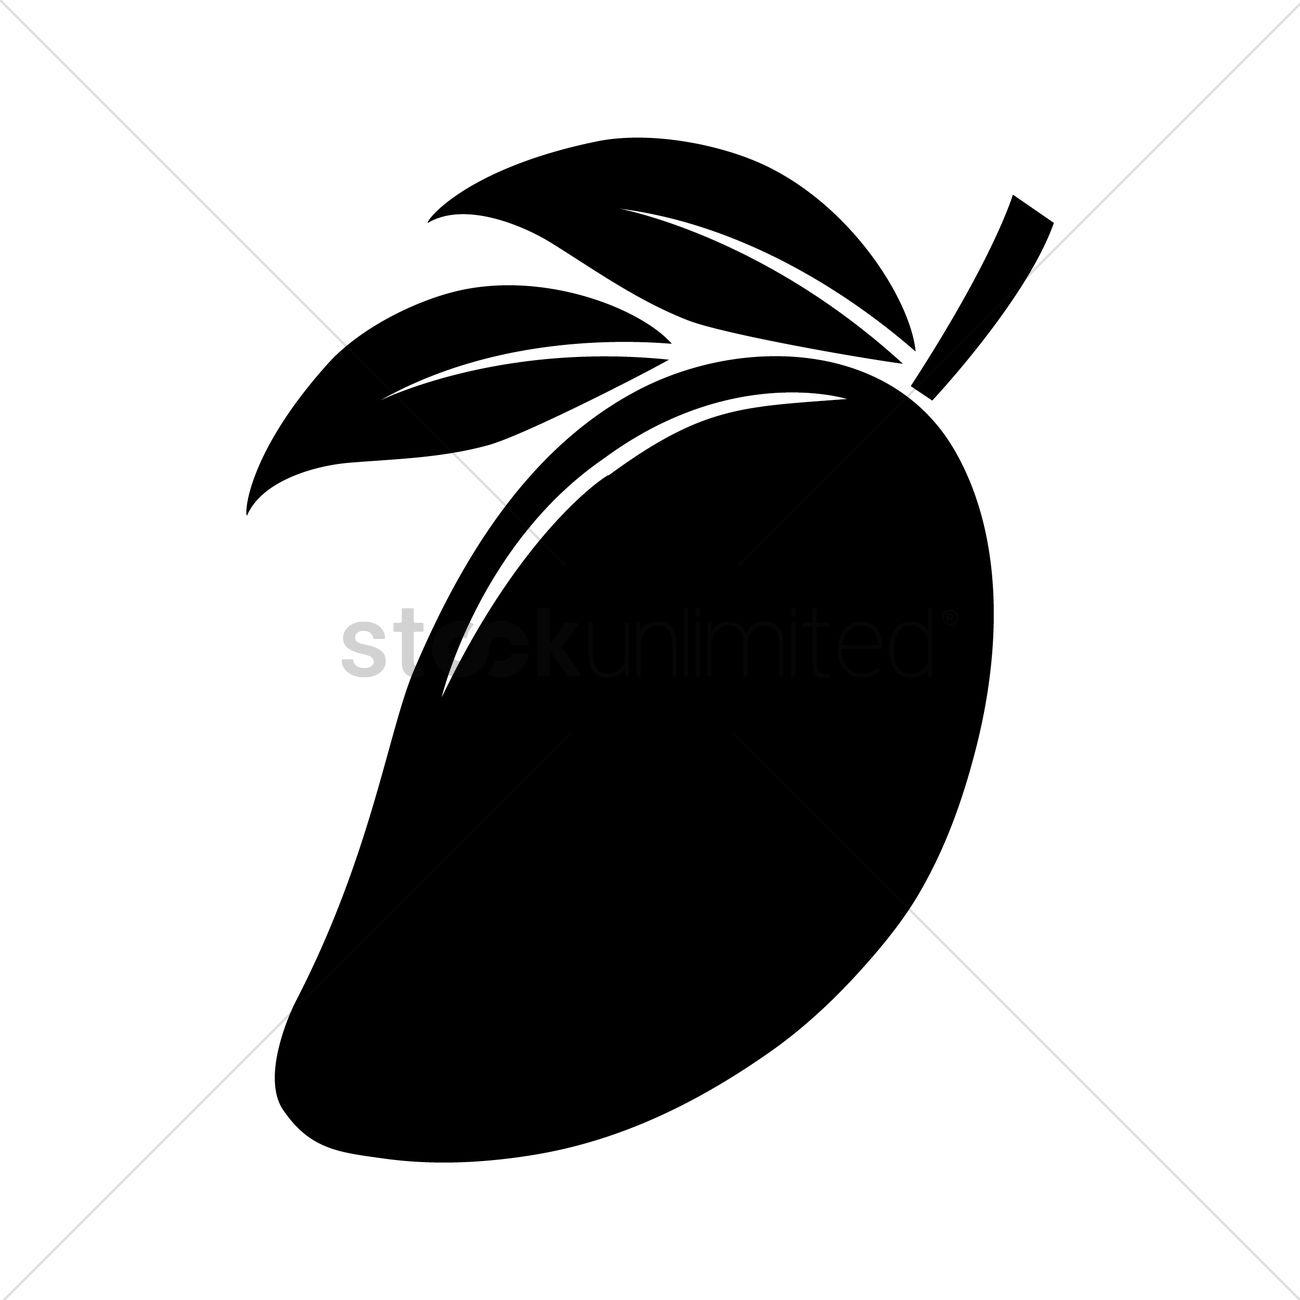 1300x1300 Silhouette Of Mango Vector Image